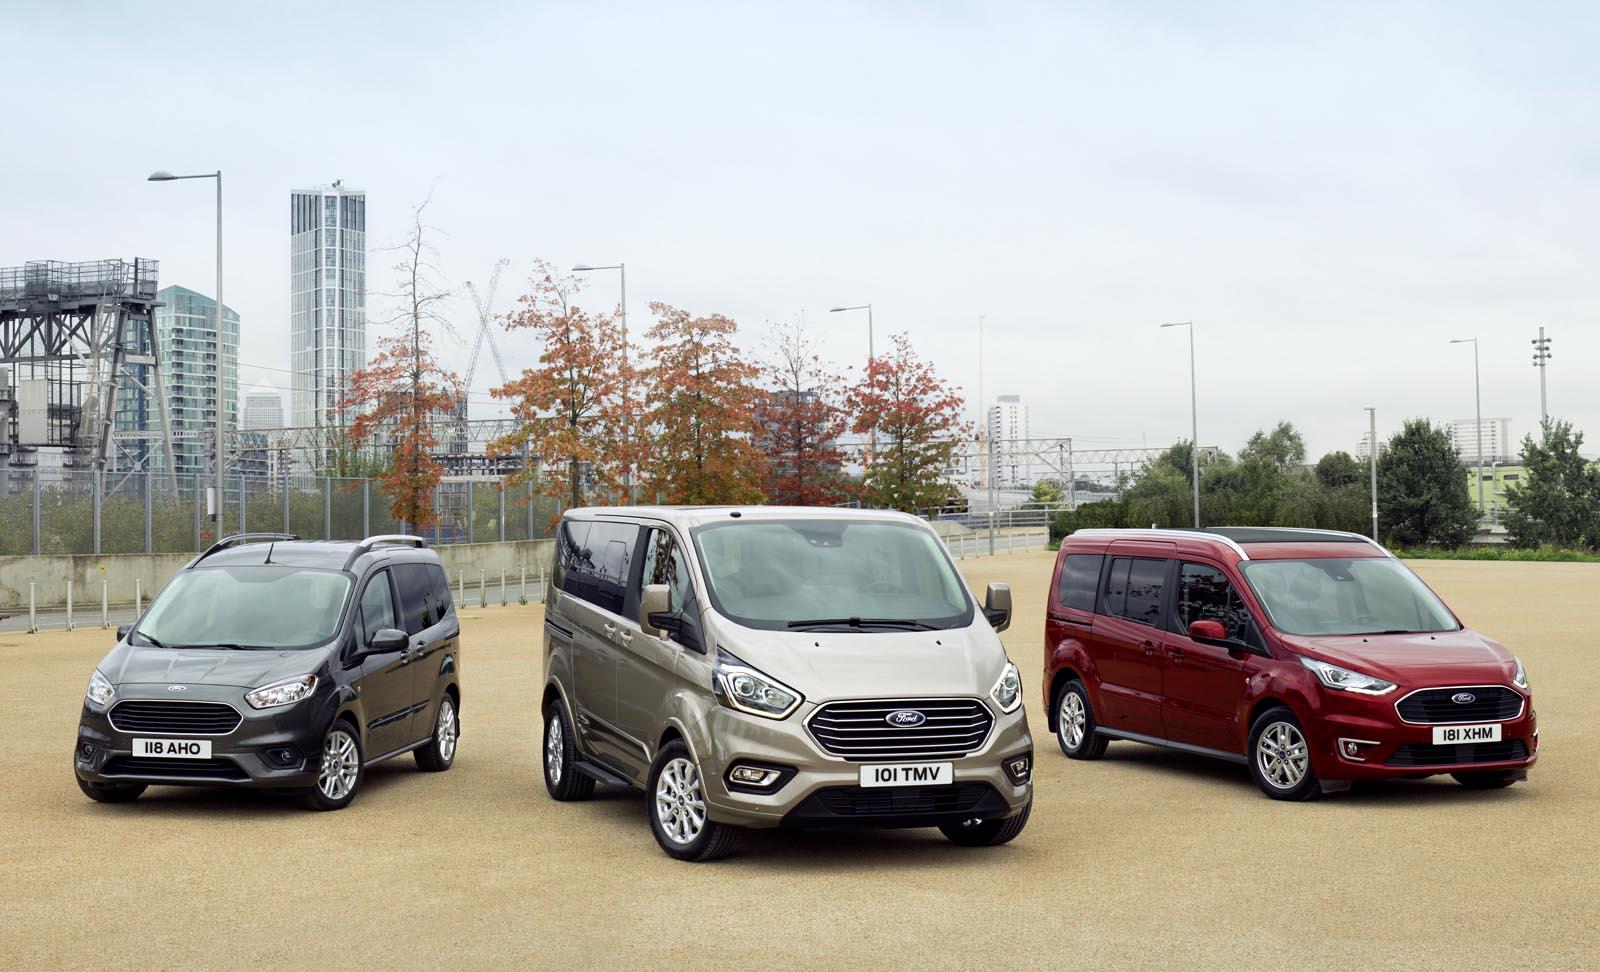 Photo of Ντεμπούτο για τη νέα σειρά μεταφοράς προσωπικού Ford Tourneo